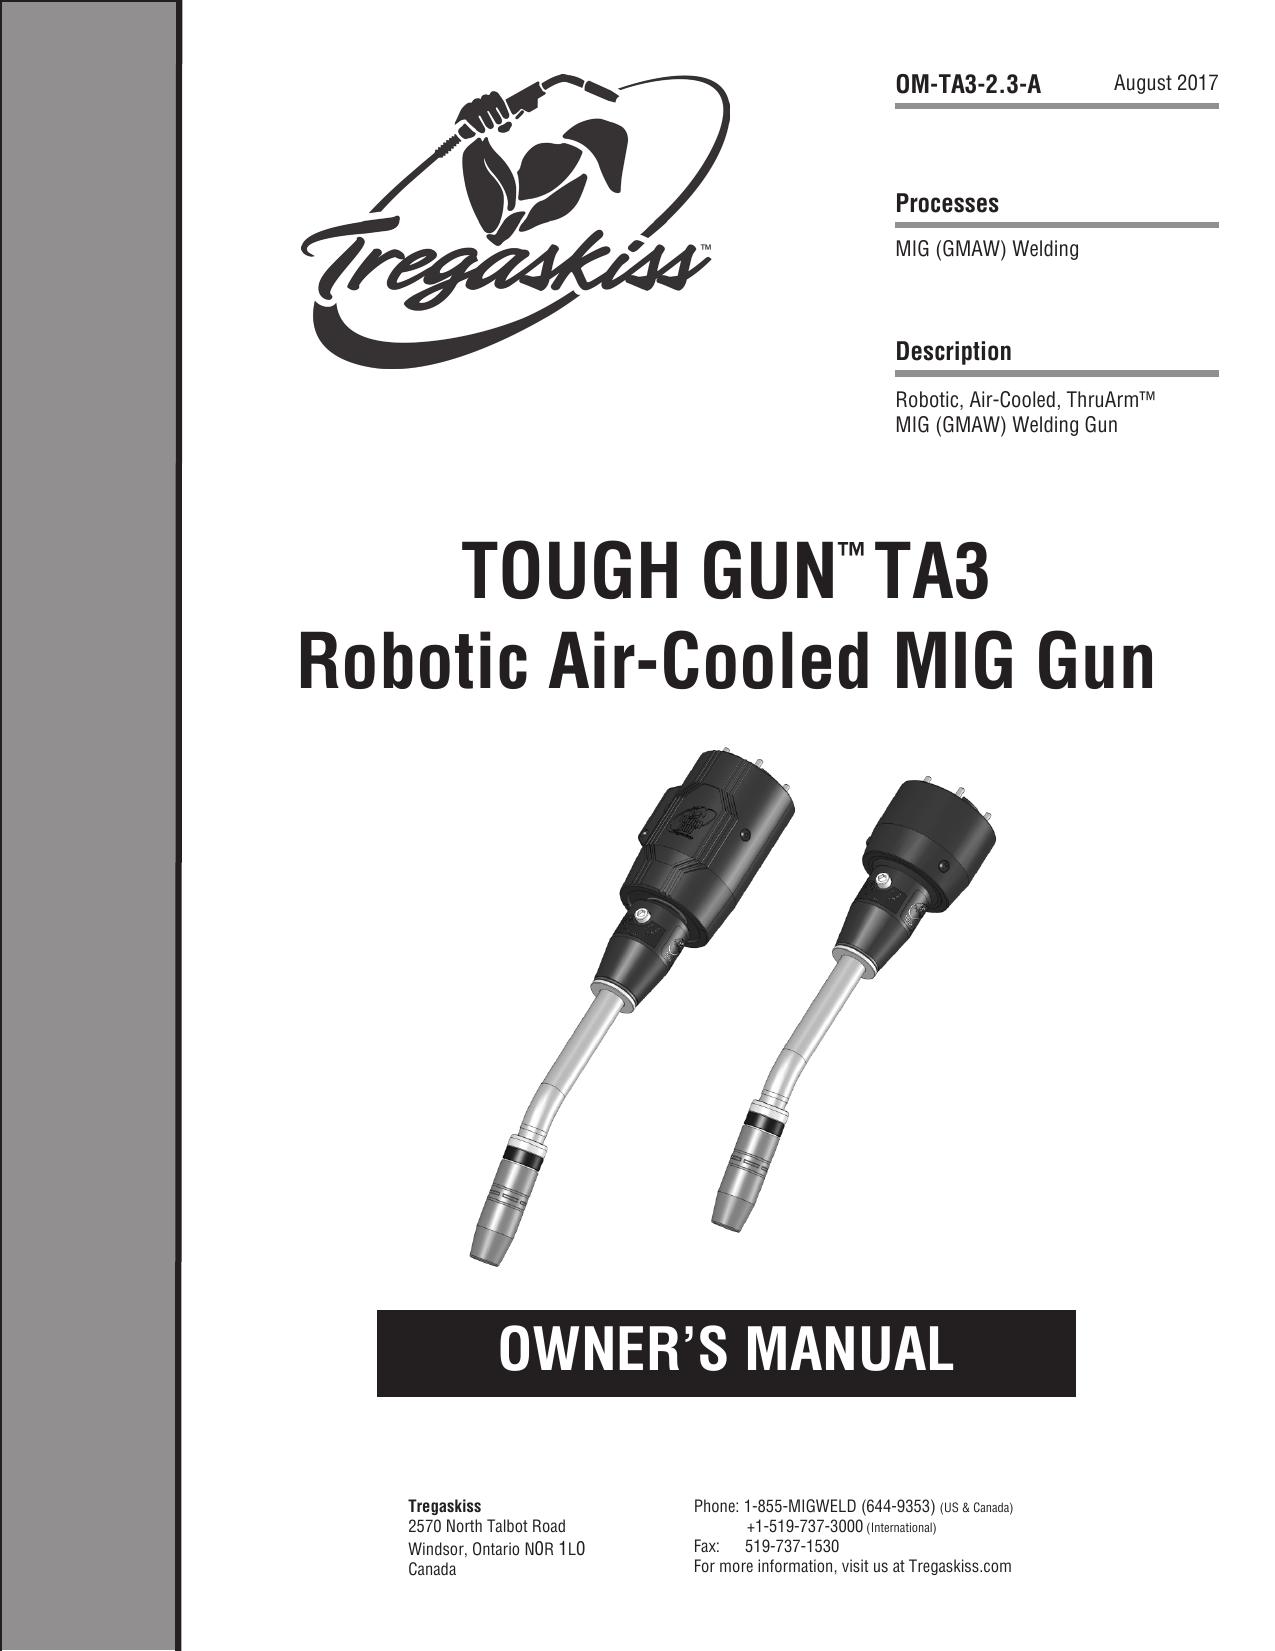 Motoman Otc Manuals Arcon Rv Power Cord Adapter 110v 30 Amp Female To 15 Male 9 Robodk Simulation Array Om Ta3 1 A Tough Gun Robotic Mig Manualzz Com Rh